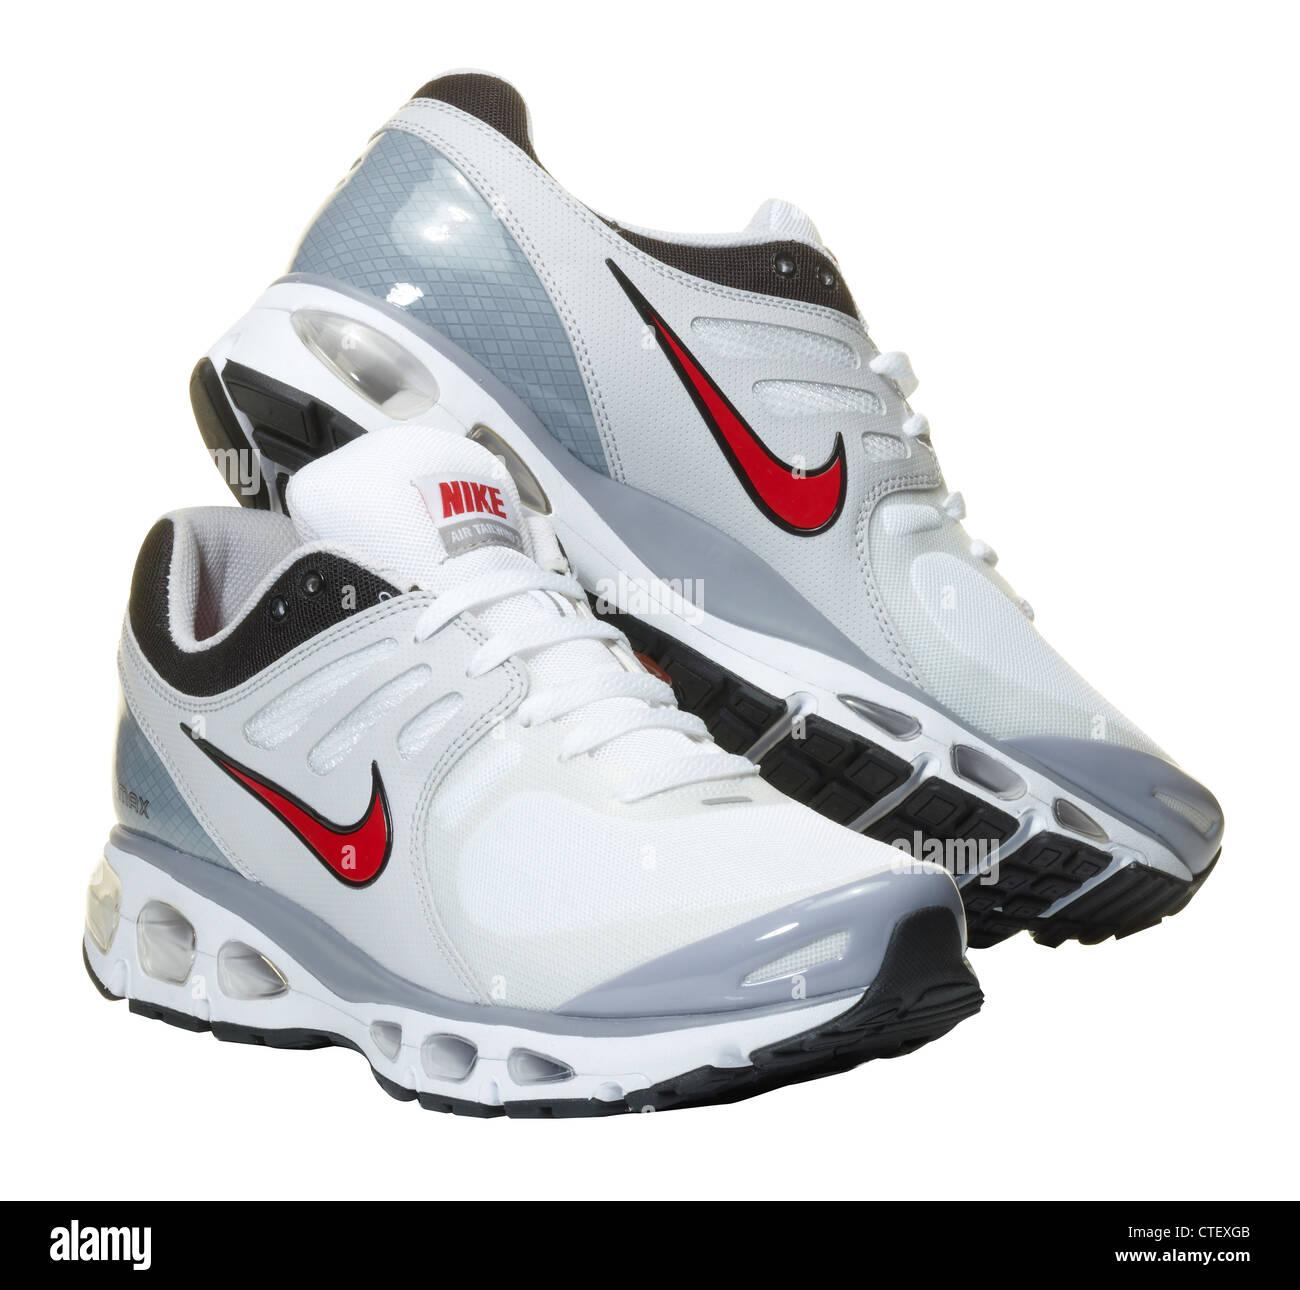 Nike Training Shoes Immagini   Nike Training Shoes Fotos Stock - Alamy bb6477a950a